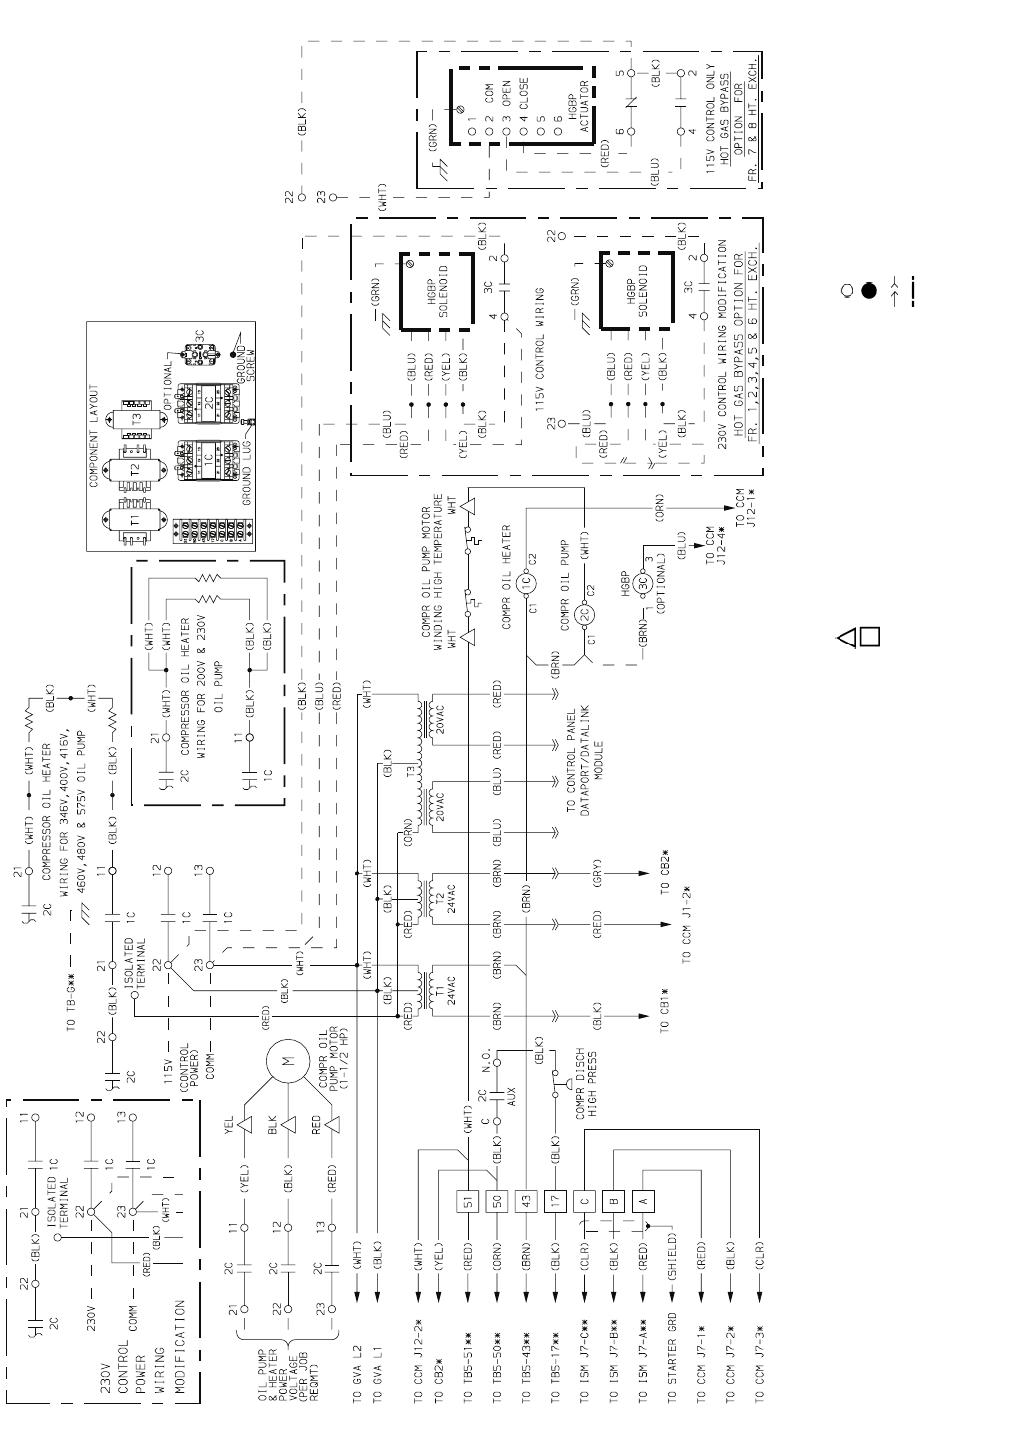 Upright Scissor Lift Jlg 3246e2 Wiring Diagrams Schematic 3246 Diagram 3246es Electrical House U2022 Grove Lifts Schematics